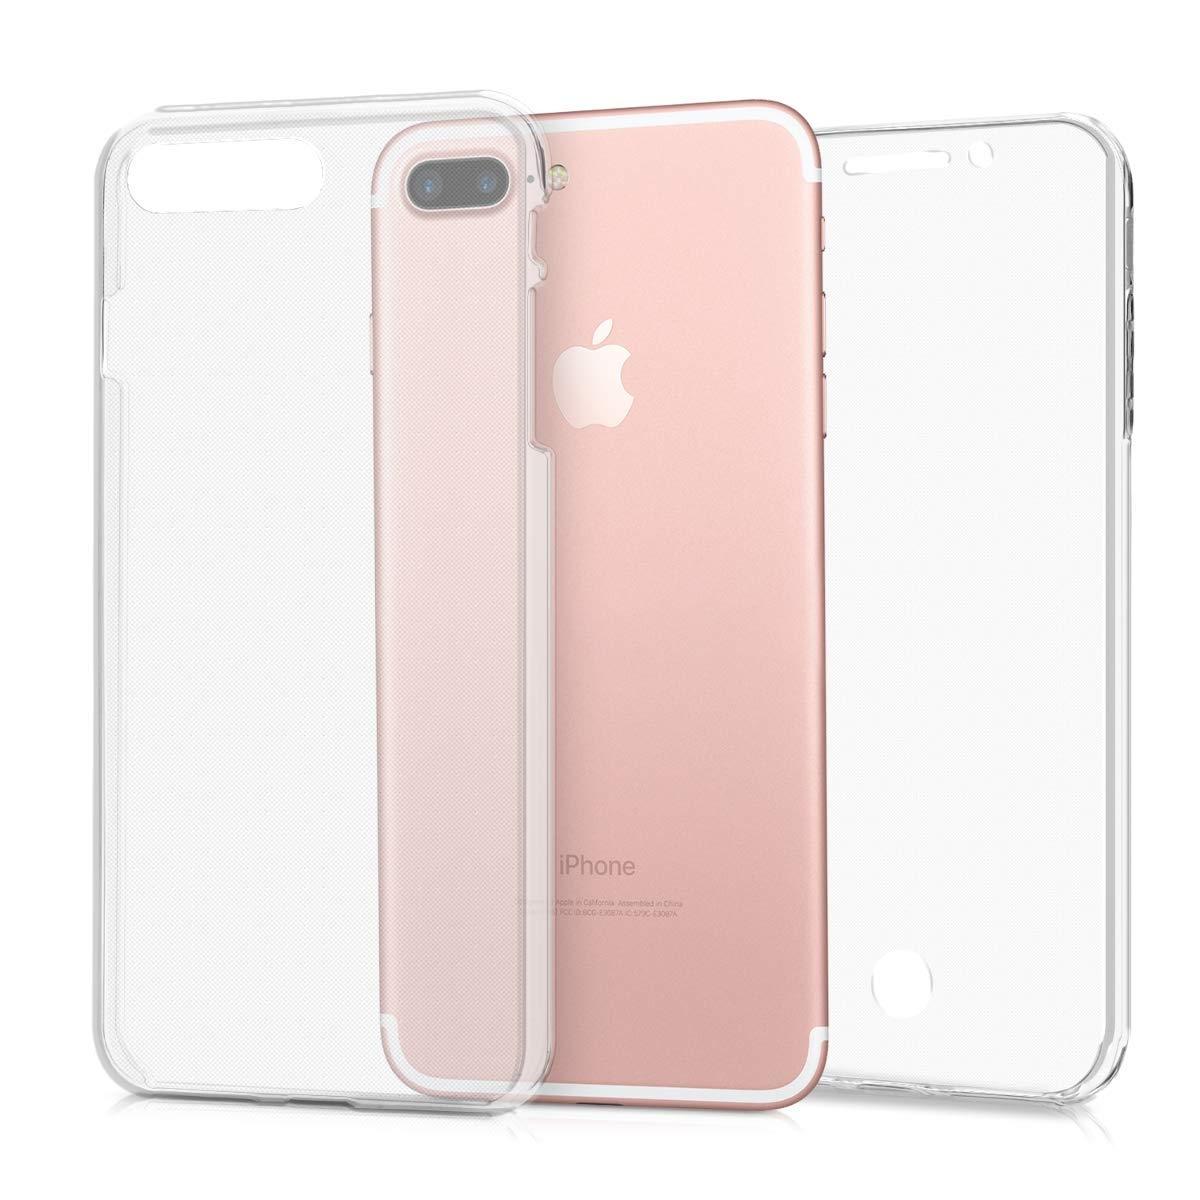 KW Διάφανη Θήκη Σιλικόνης Full Body iPhone 8 Plus / 7 Plus - Transparent (44957.03)